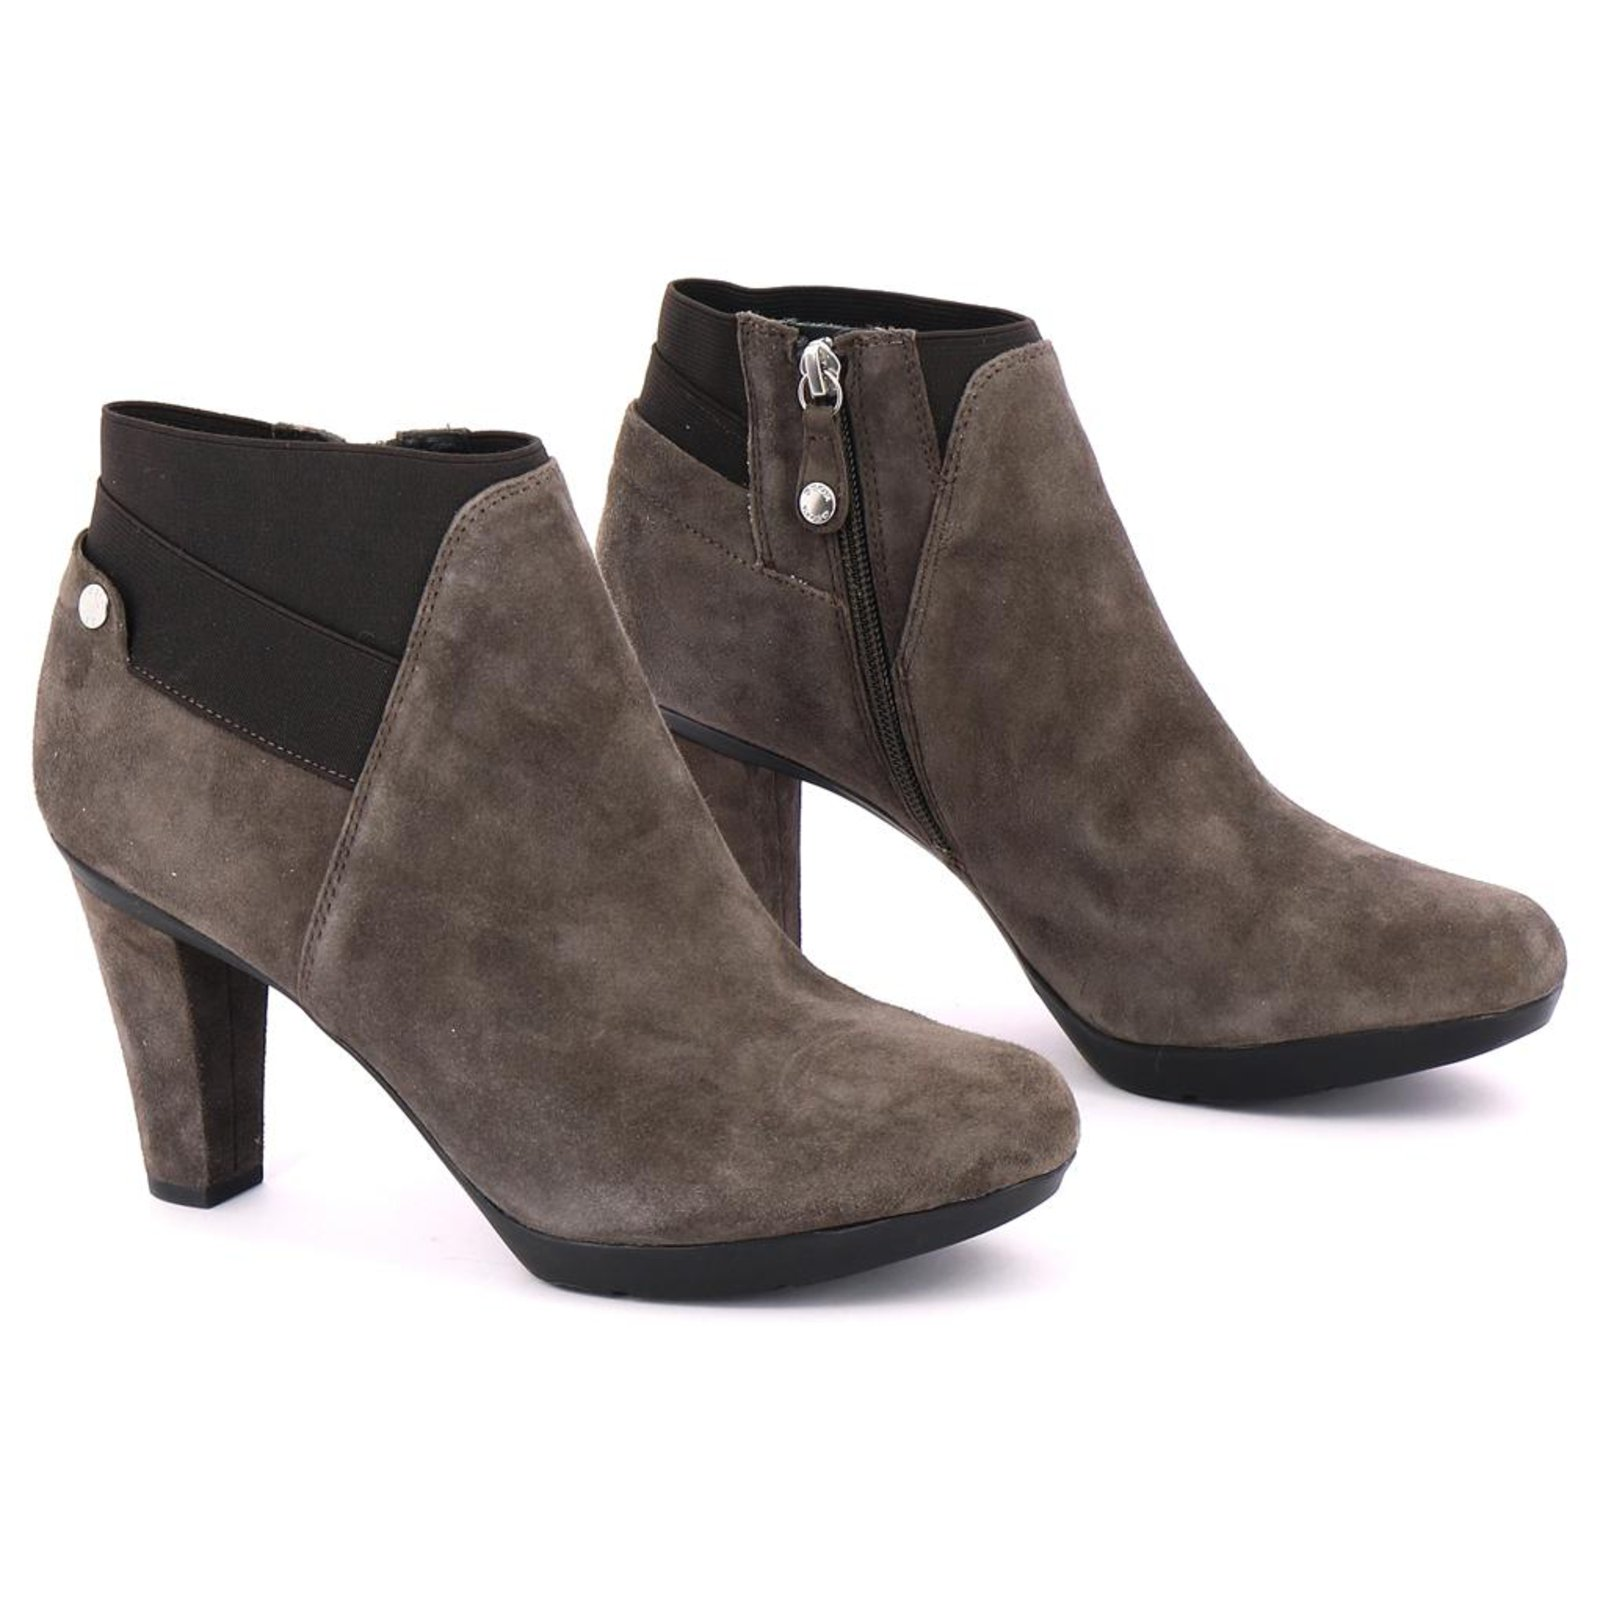 Boots Nubuck Geox Marron 112689 Bottines Low Ref 7bYf6gy